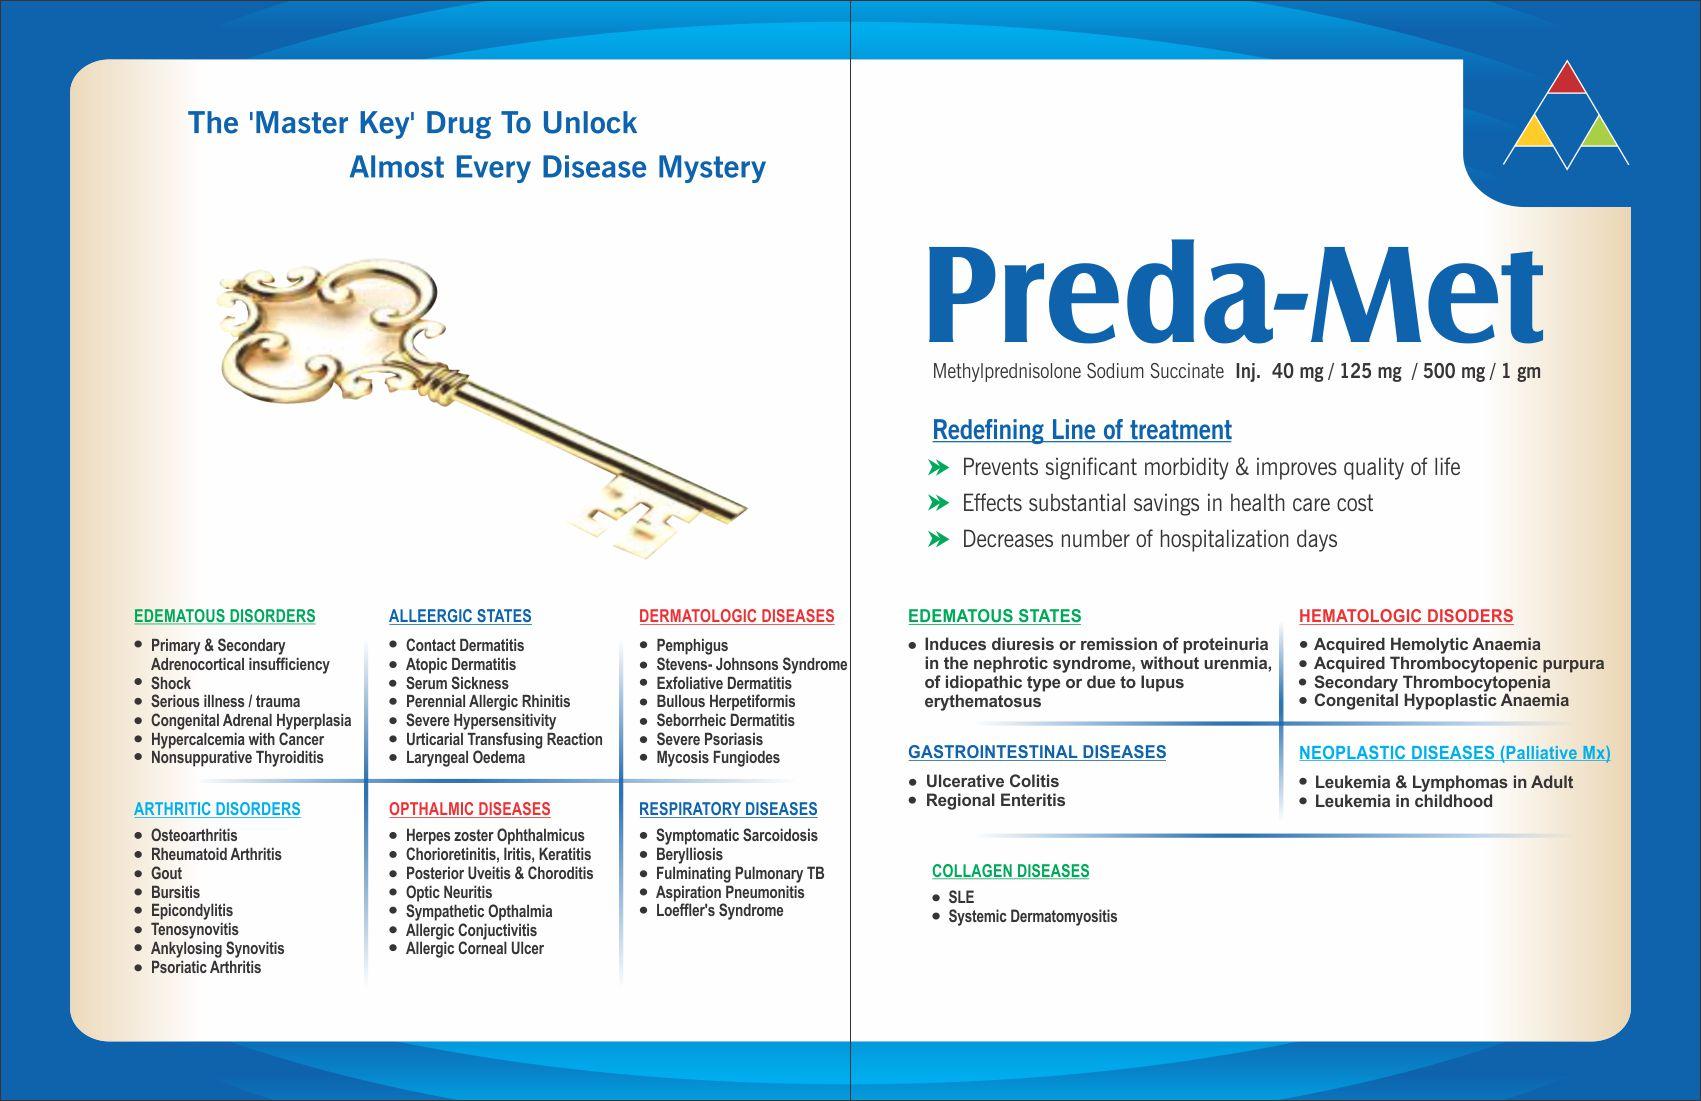 Preda-MET